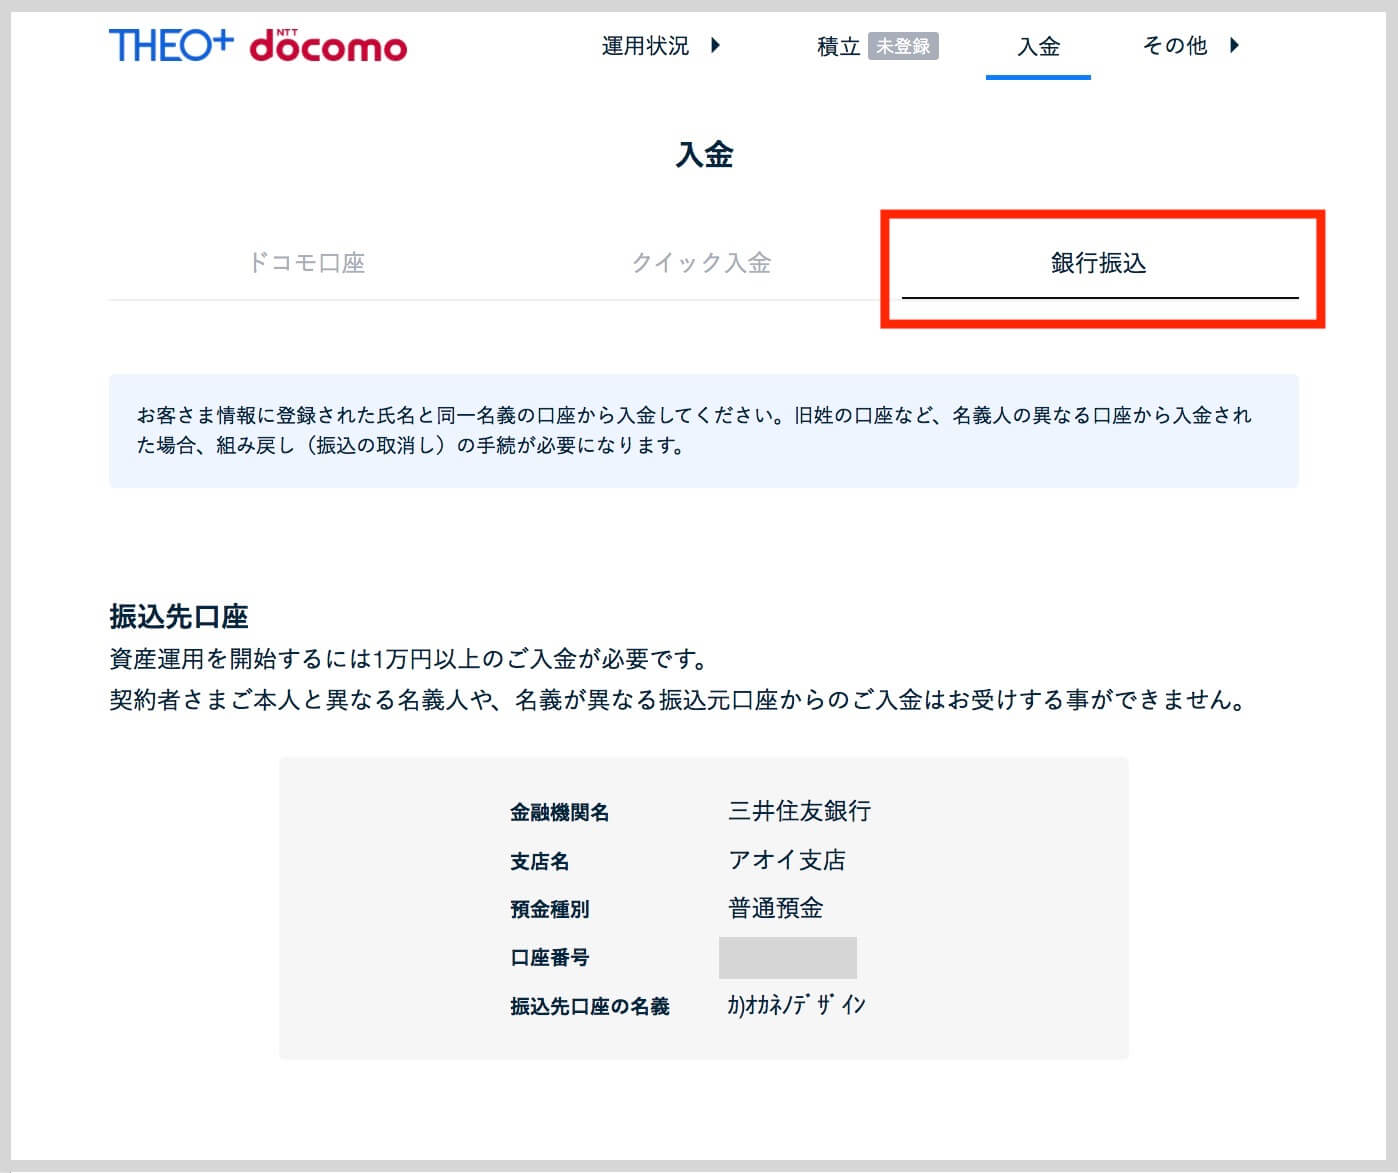 THEO+docomo_銀行振込